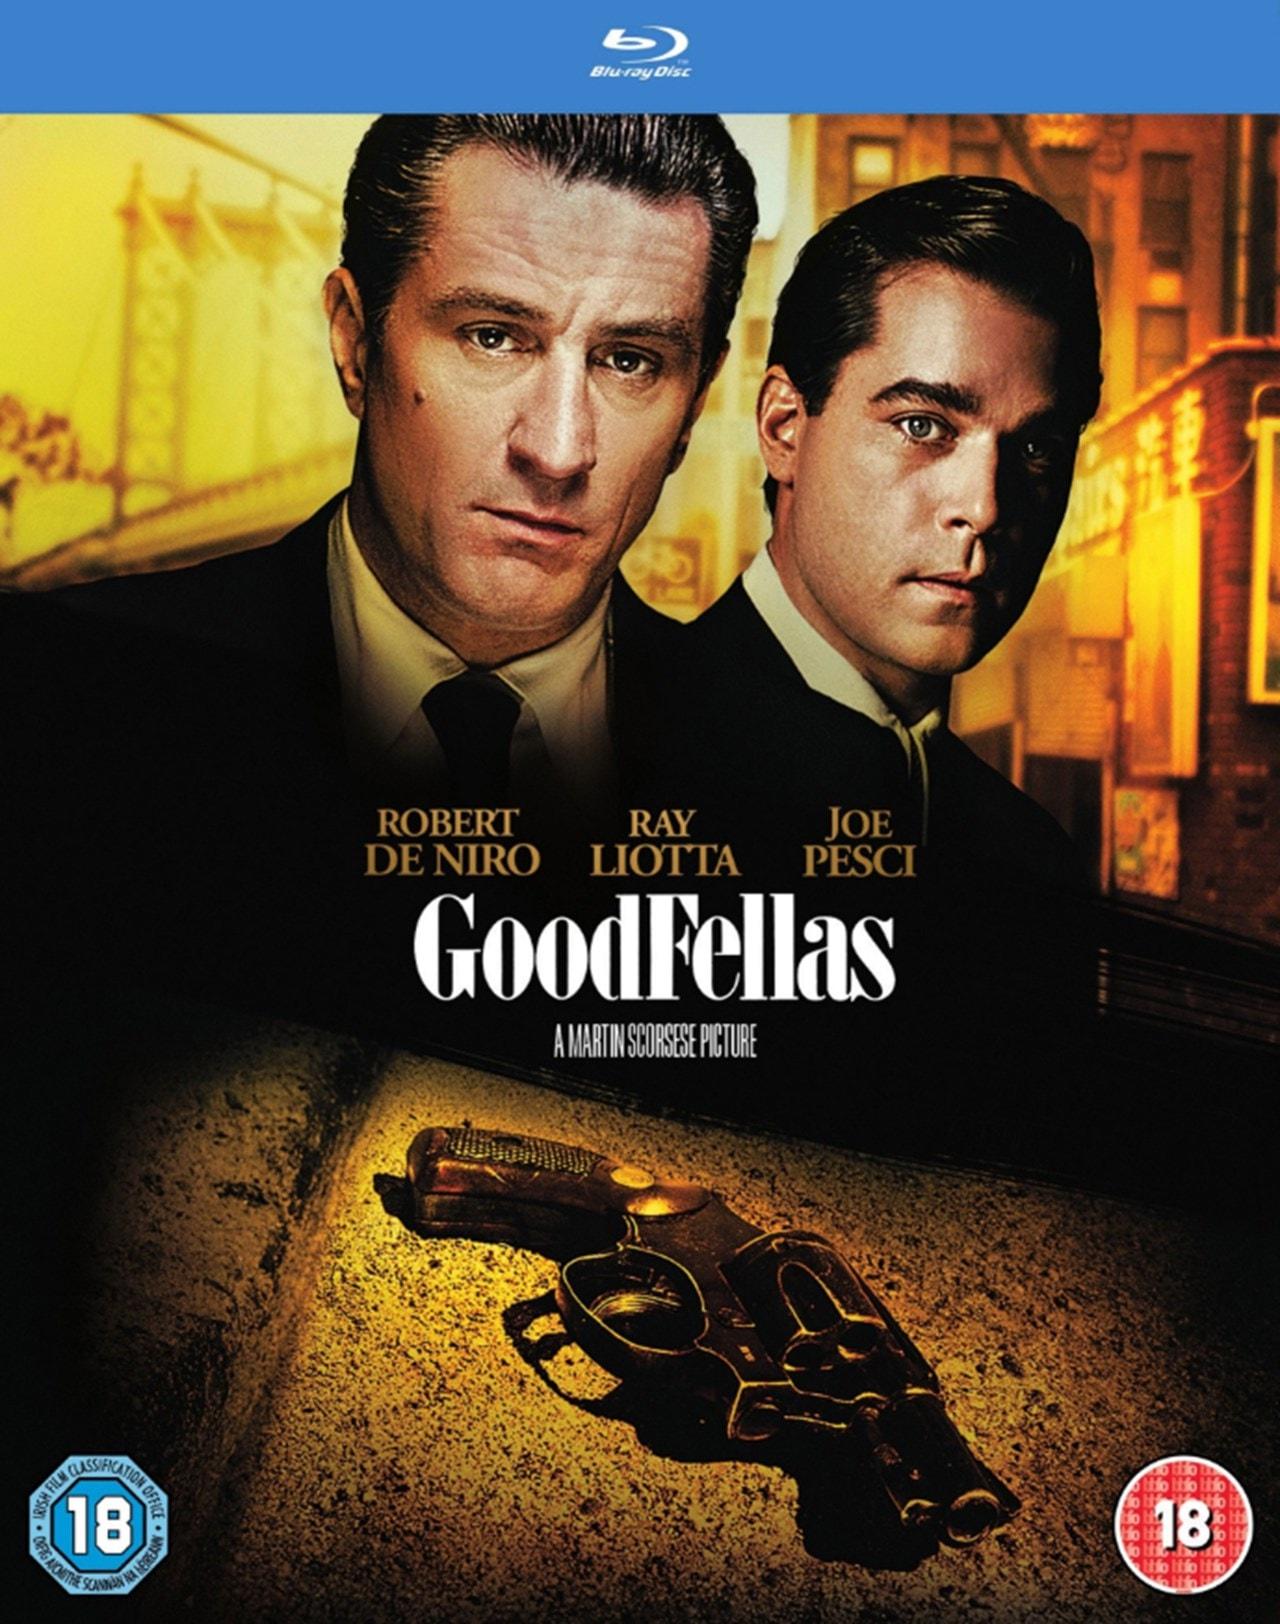 Goodfellas - 1